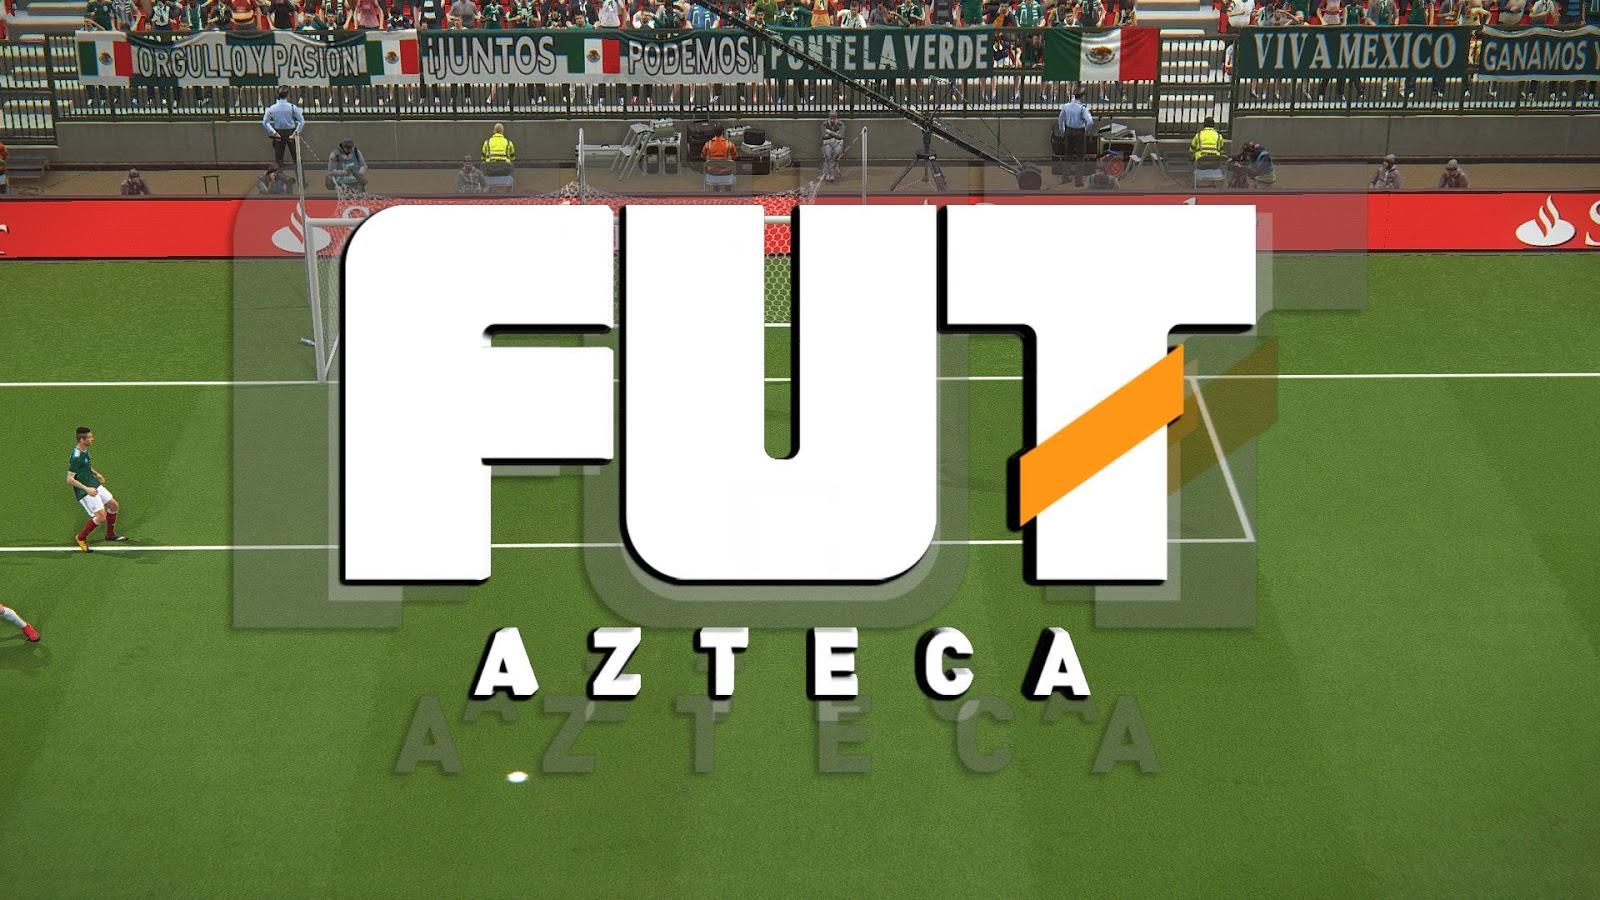 PES 2018 Tv Azteca Scoreboard Fantasy (Beta) by xDark Mauri15x